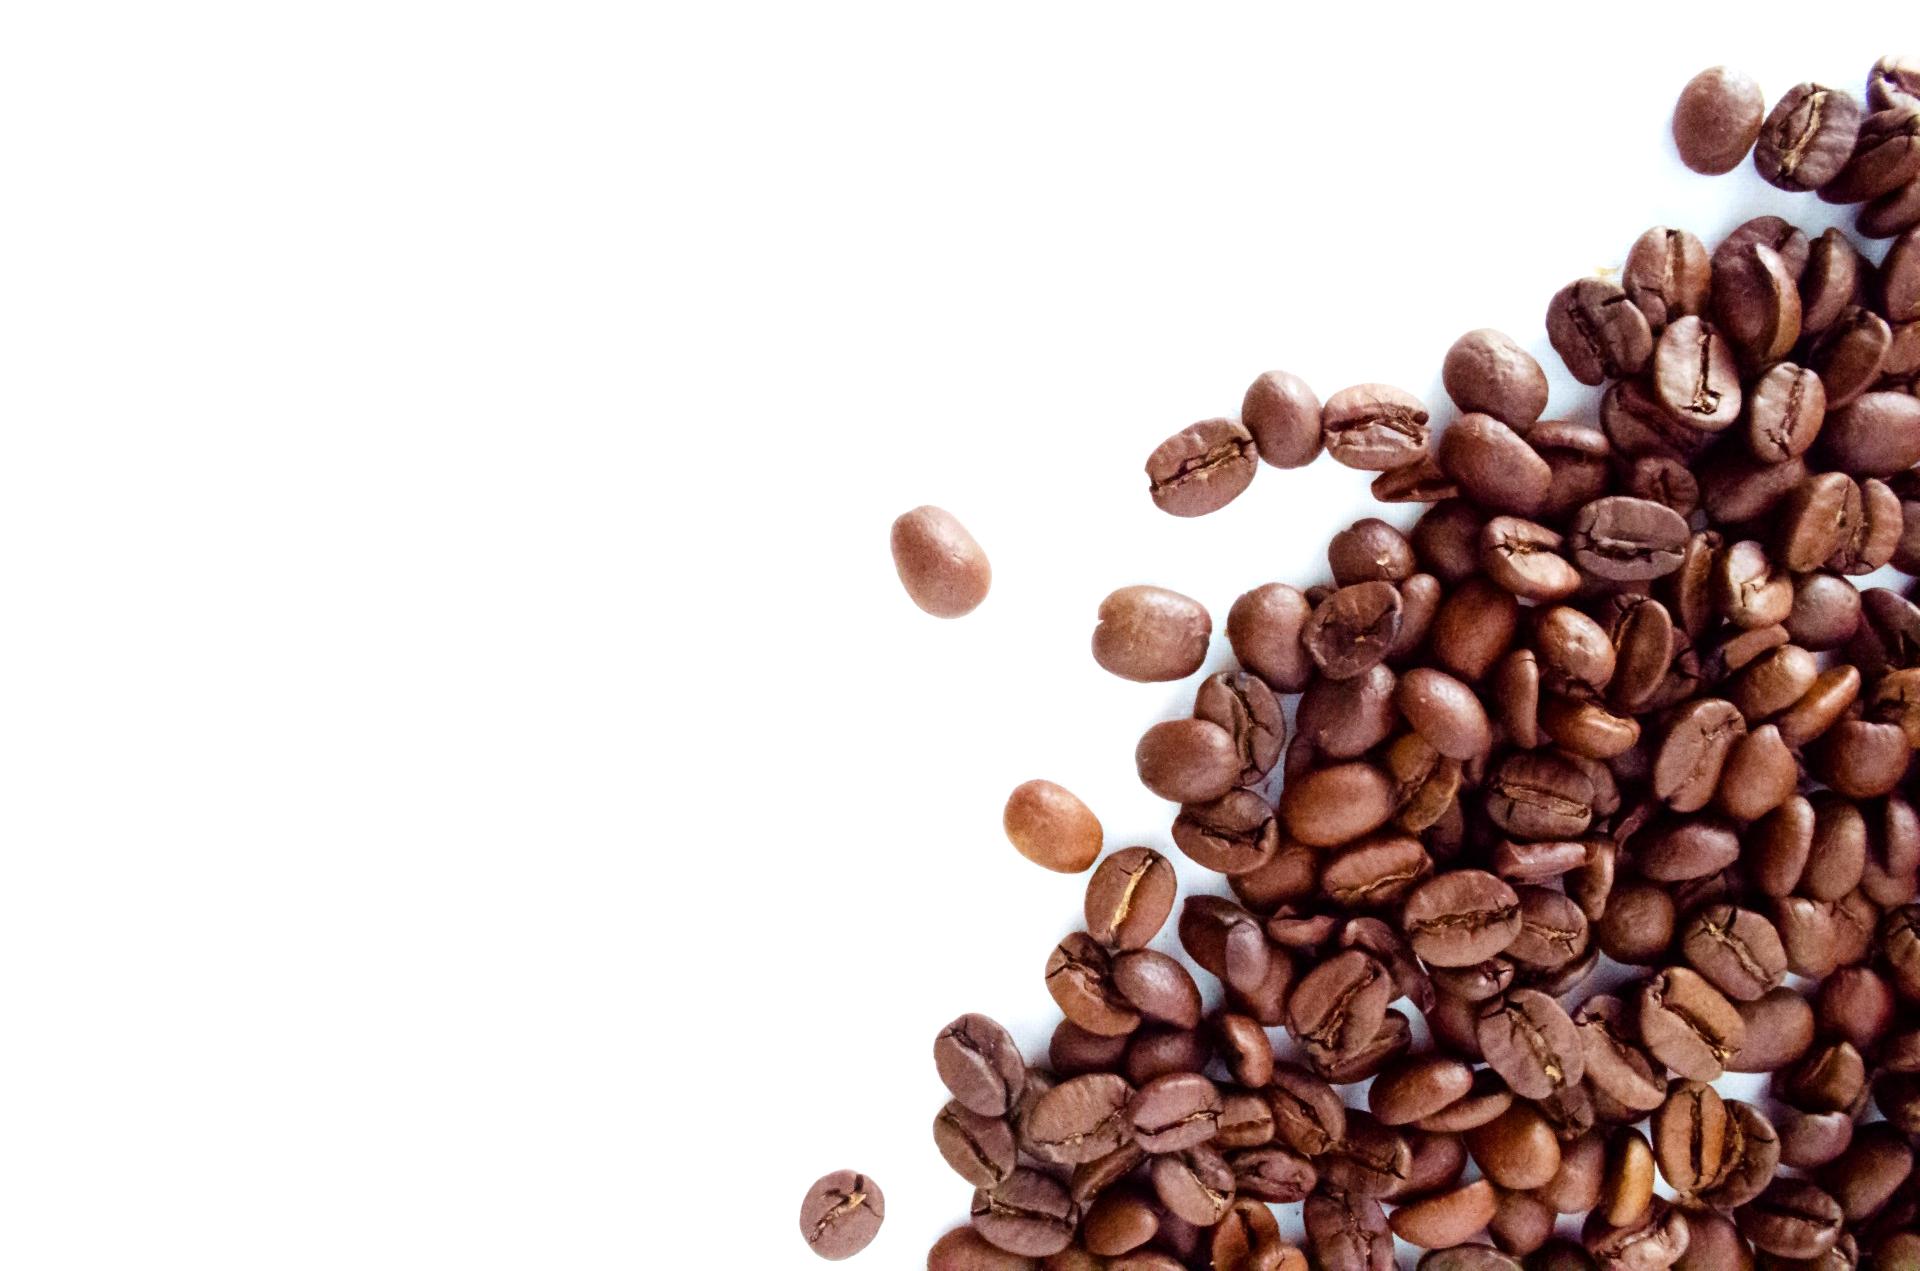 The Coffee Bean & Tea Leaf Espresso Cafe Dolce Gusto.